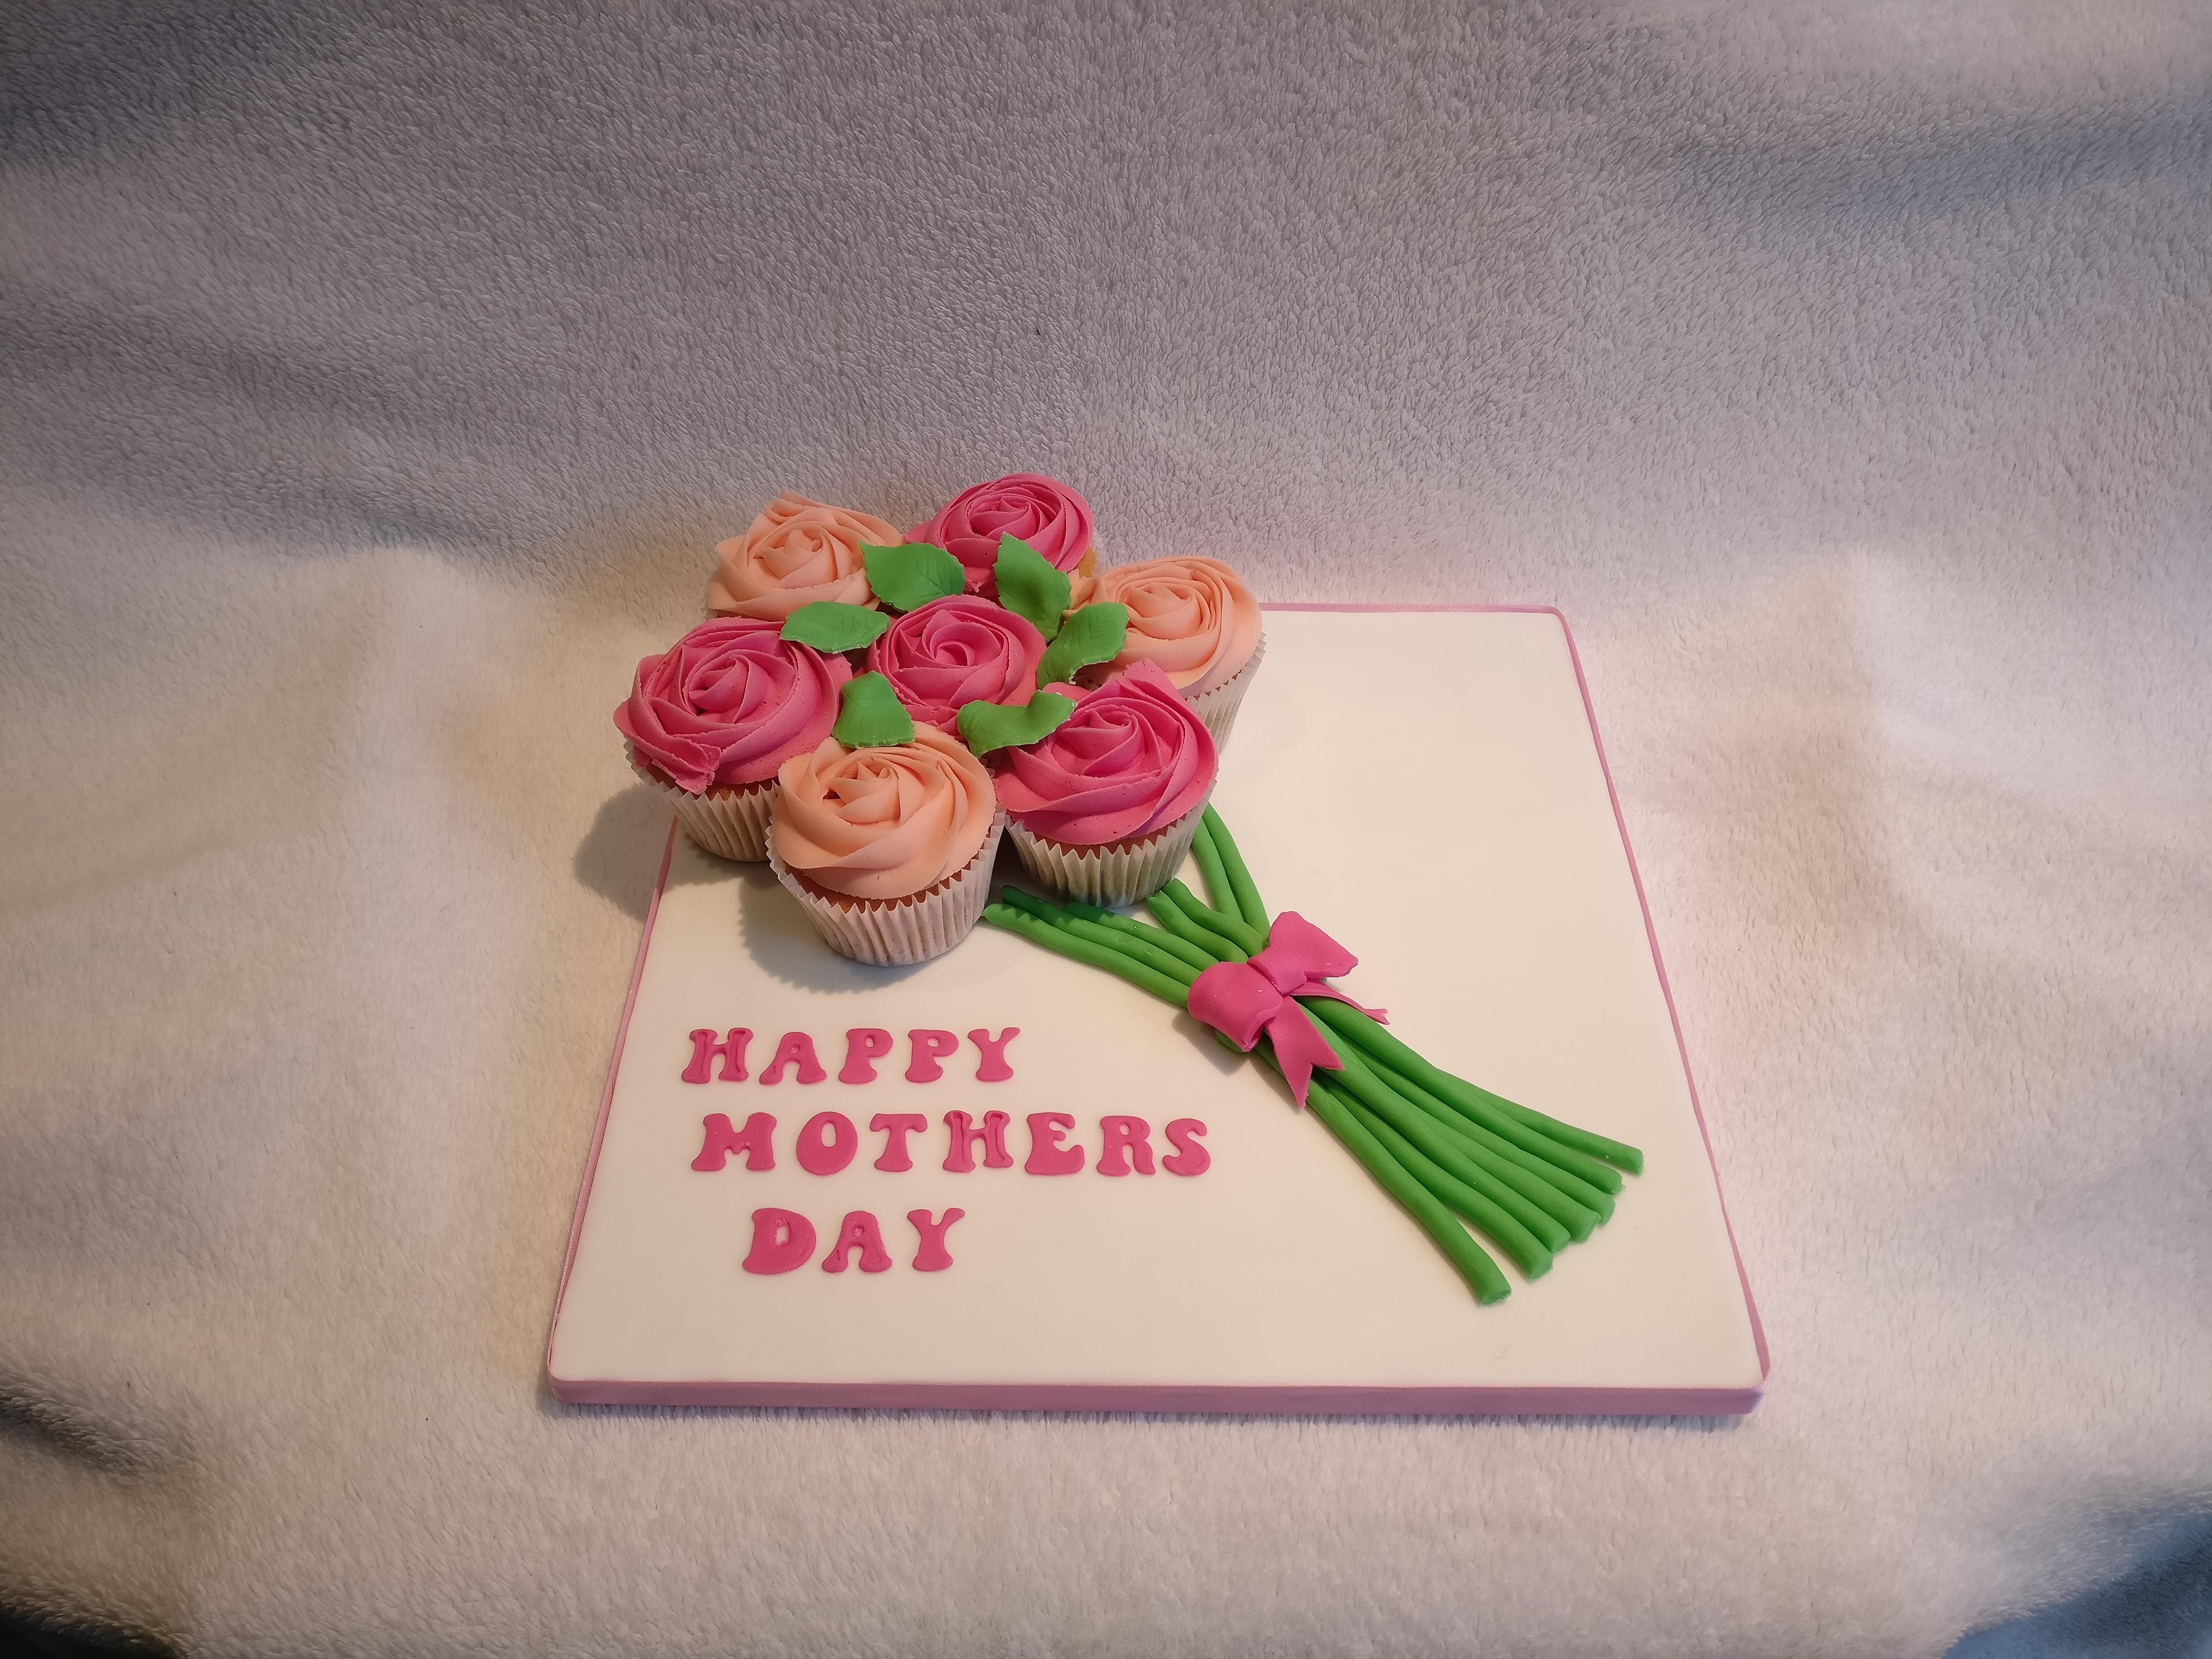 Cupcake bouquets sweet treat cakes bakes contact izmirmasajfo